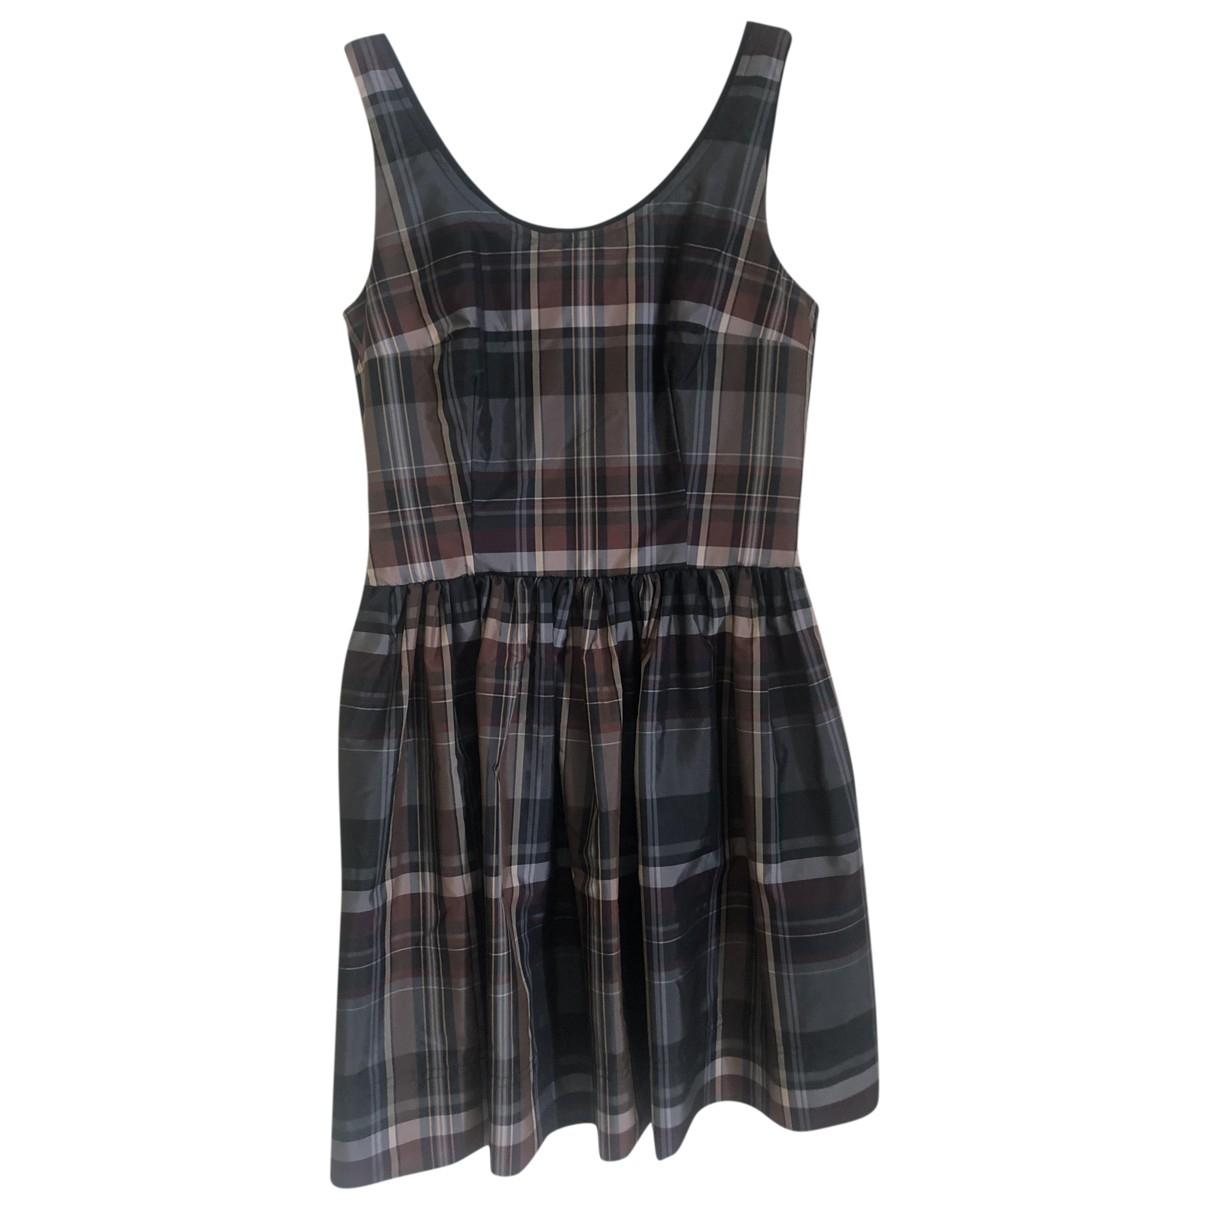 Max & Co \N Multicolour dress for Women 38 IT